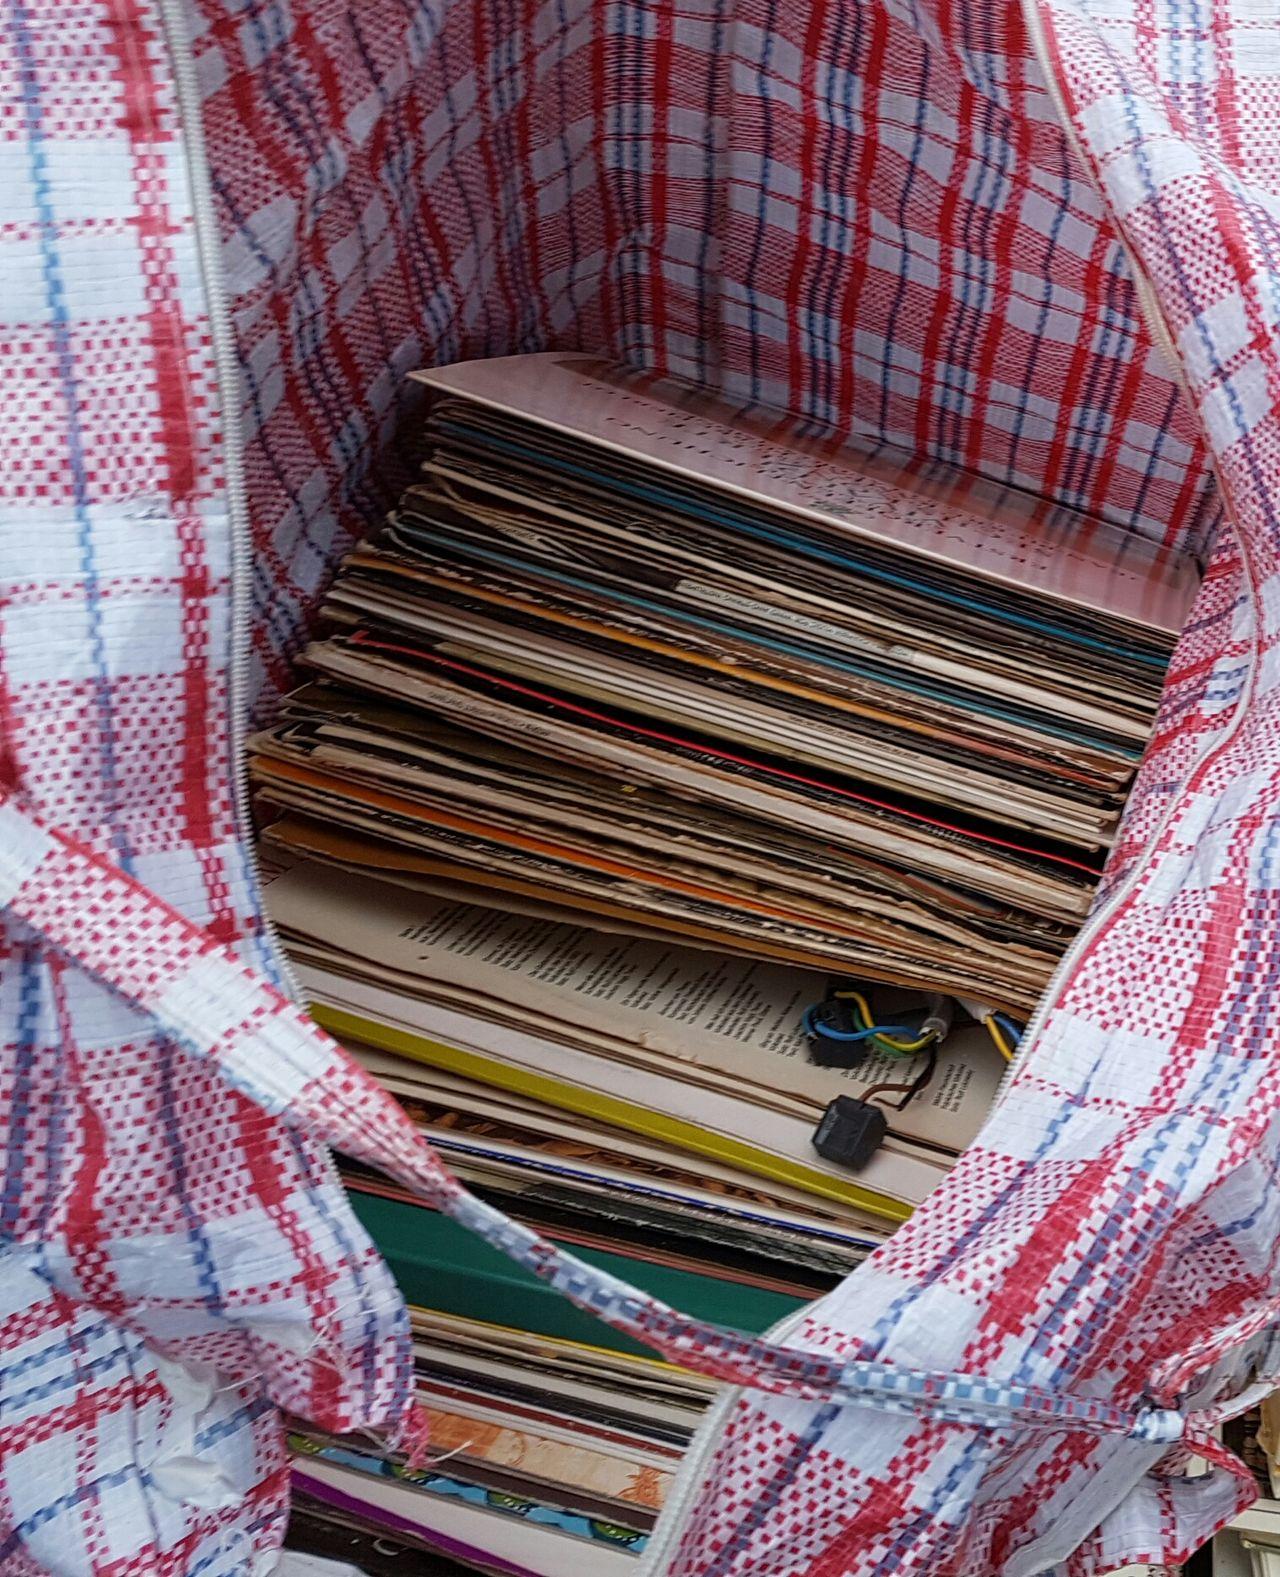 Secondhand Market Fleamarket Flea Markets Fleamarkets Flea Market Brocante Second Hand Market Cover For Sale Music LPs Music Market Longplayer Records Old Records Vintage Records Recordstore Recordsstore